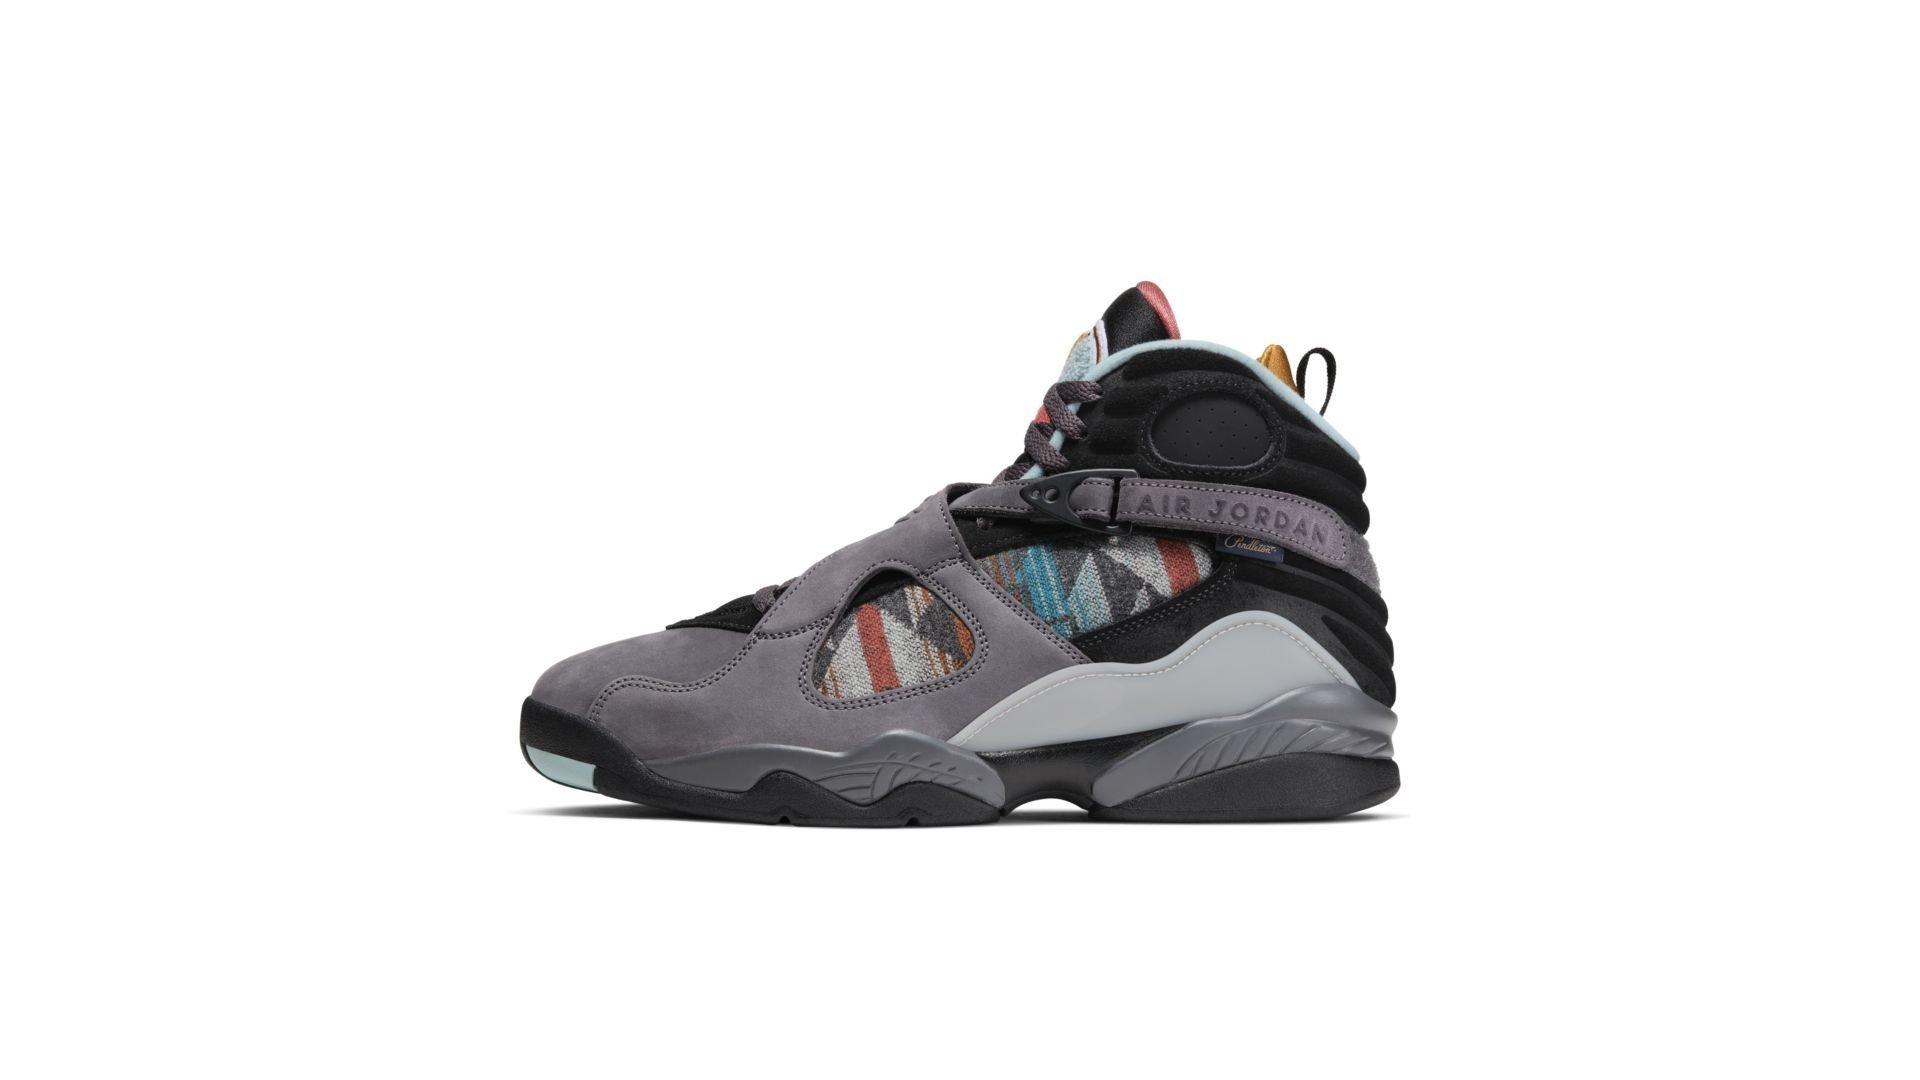 Jordan 8 Retro N7 (2019) (CQ9601-001)